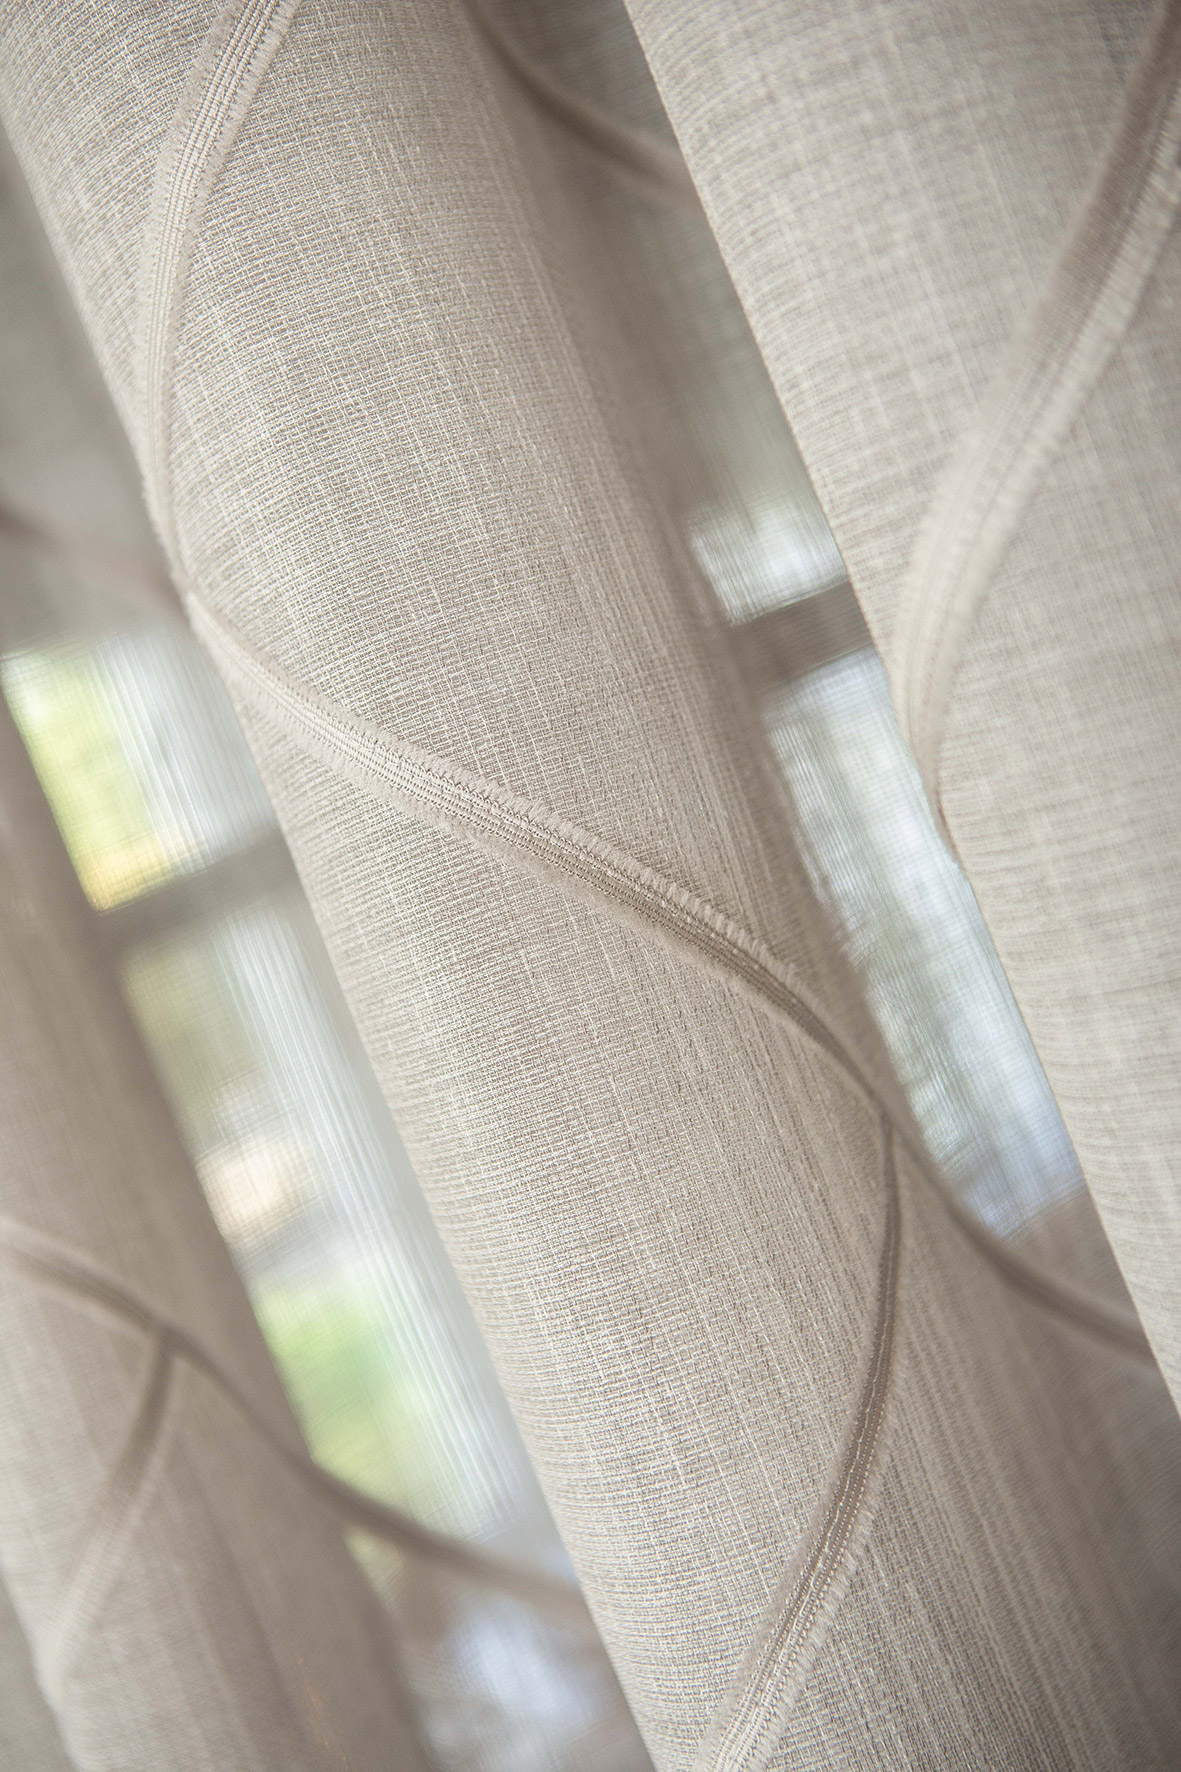 Rasch_Textil_Franja_Detail.jpg